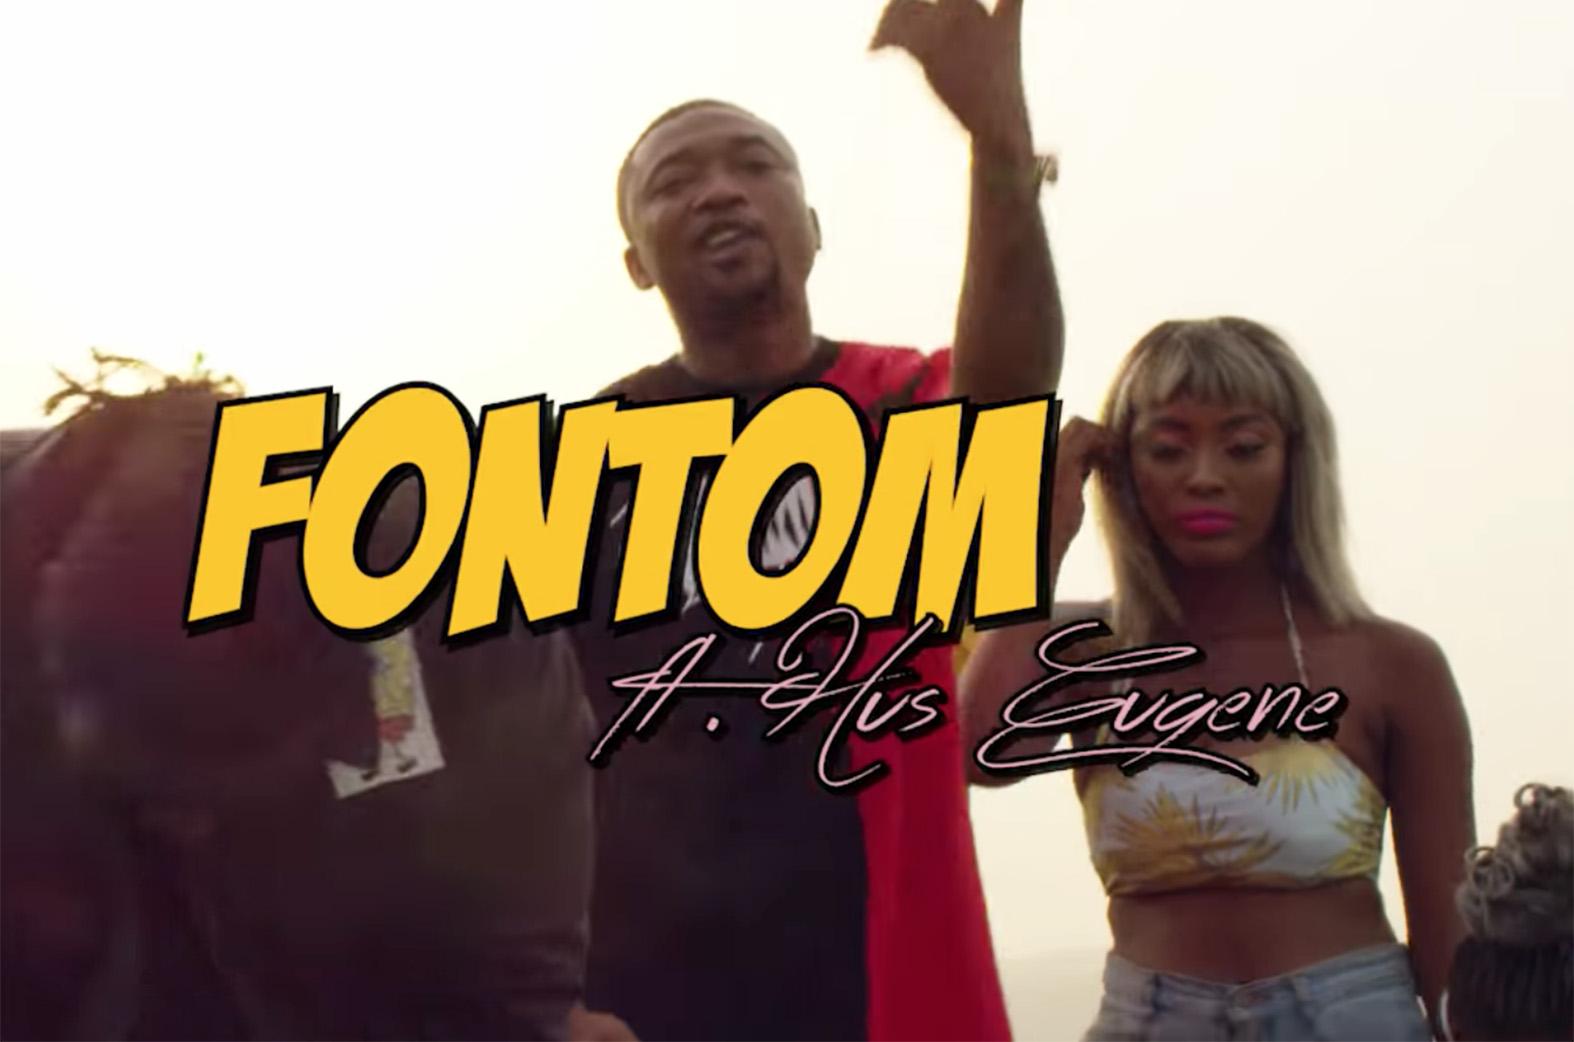 Tonight by Fontom feat. Hus Eugene